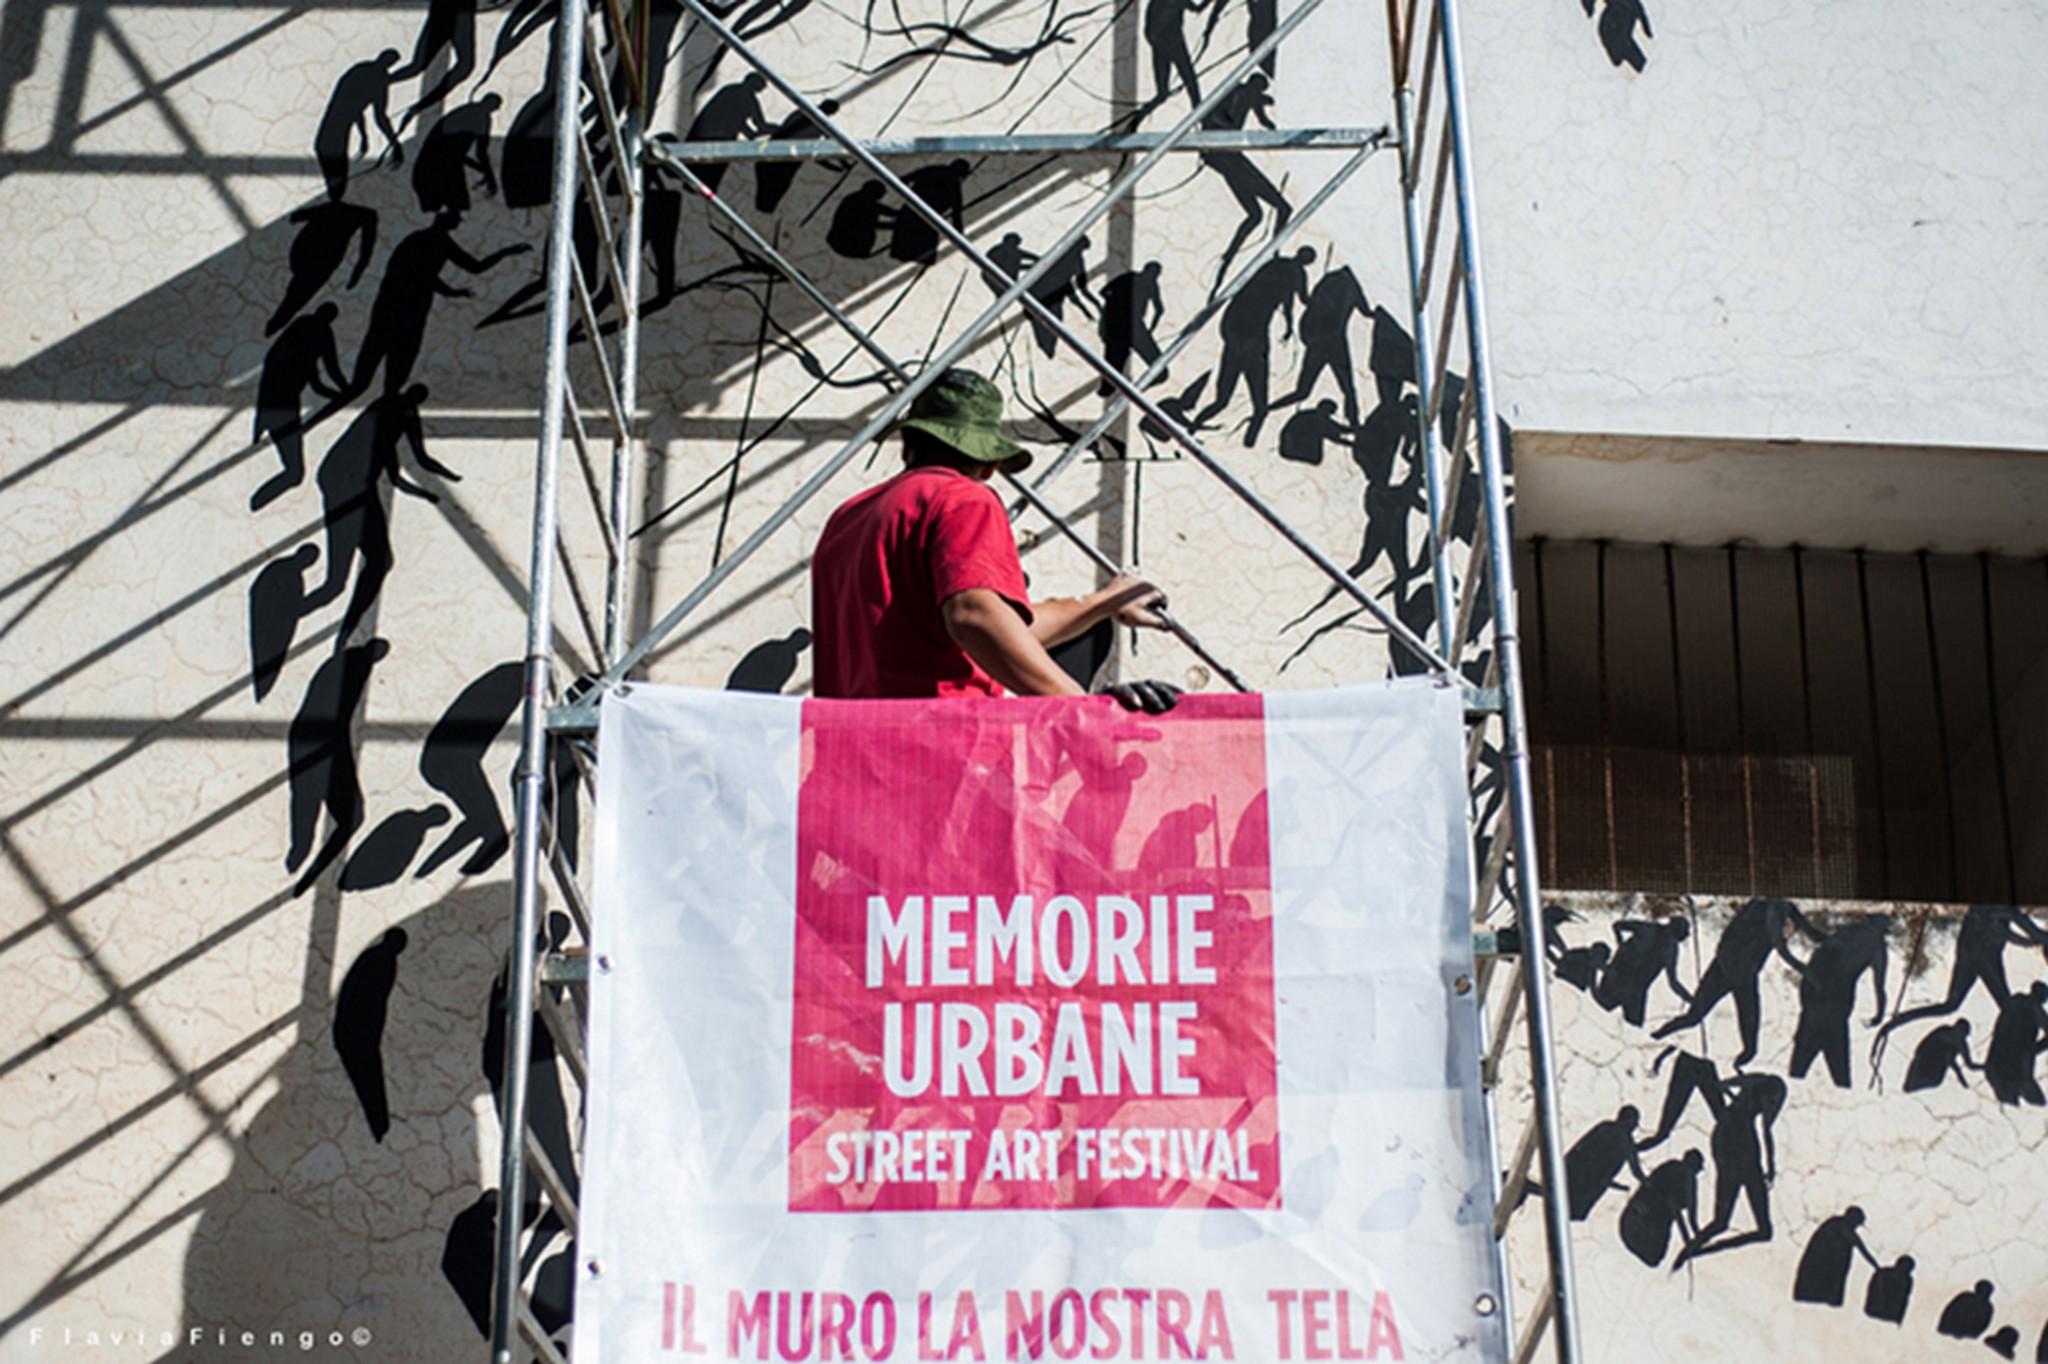 Flavia_Fiengo_memorie urbane00007